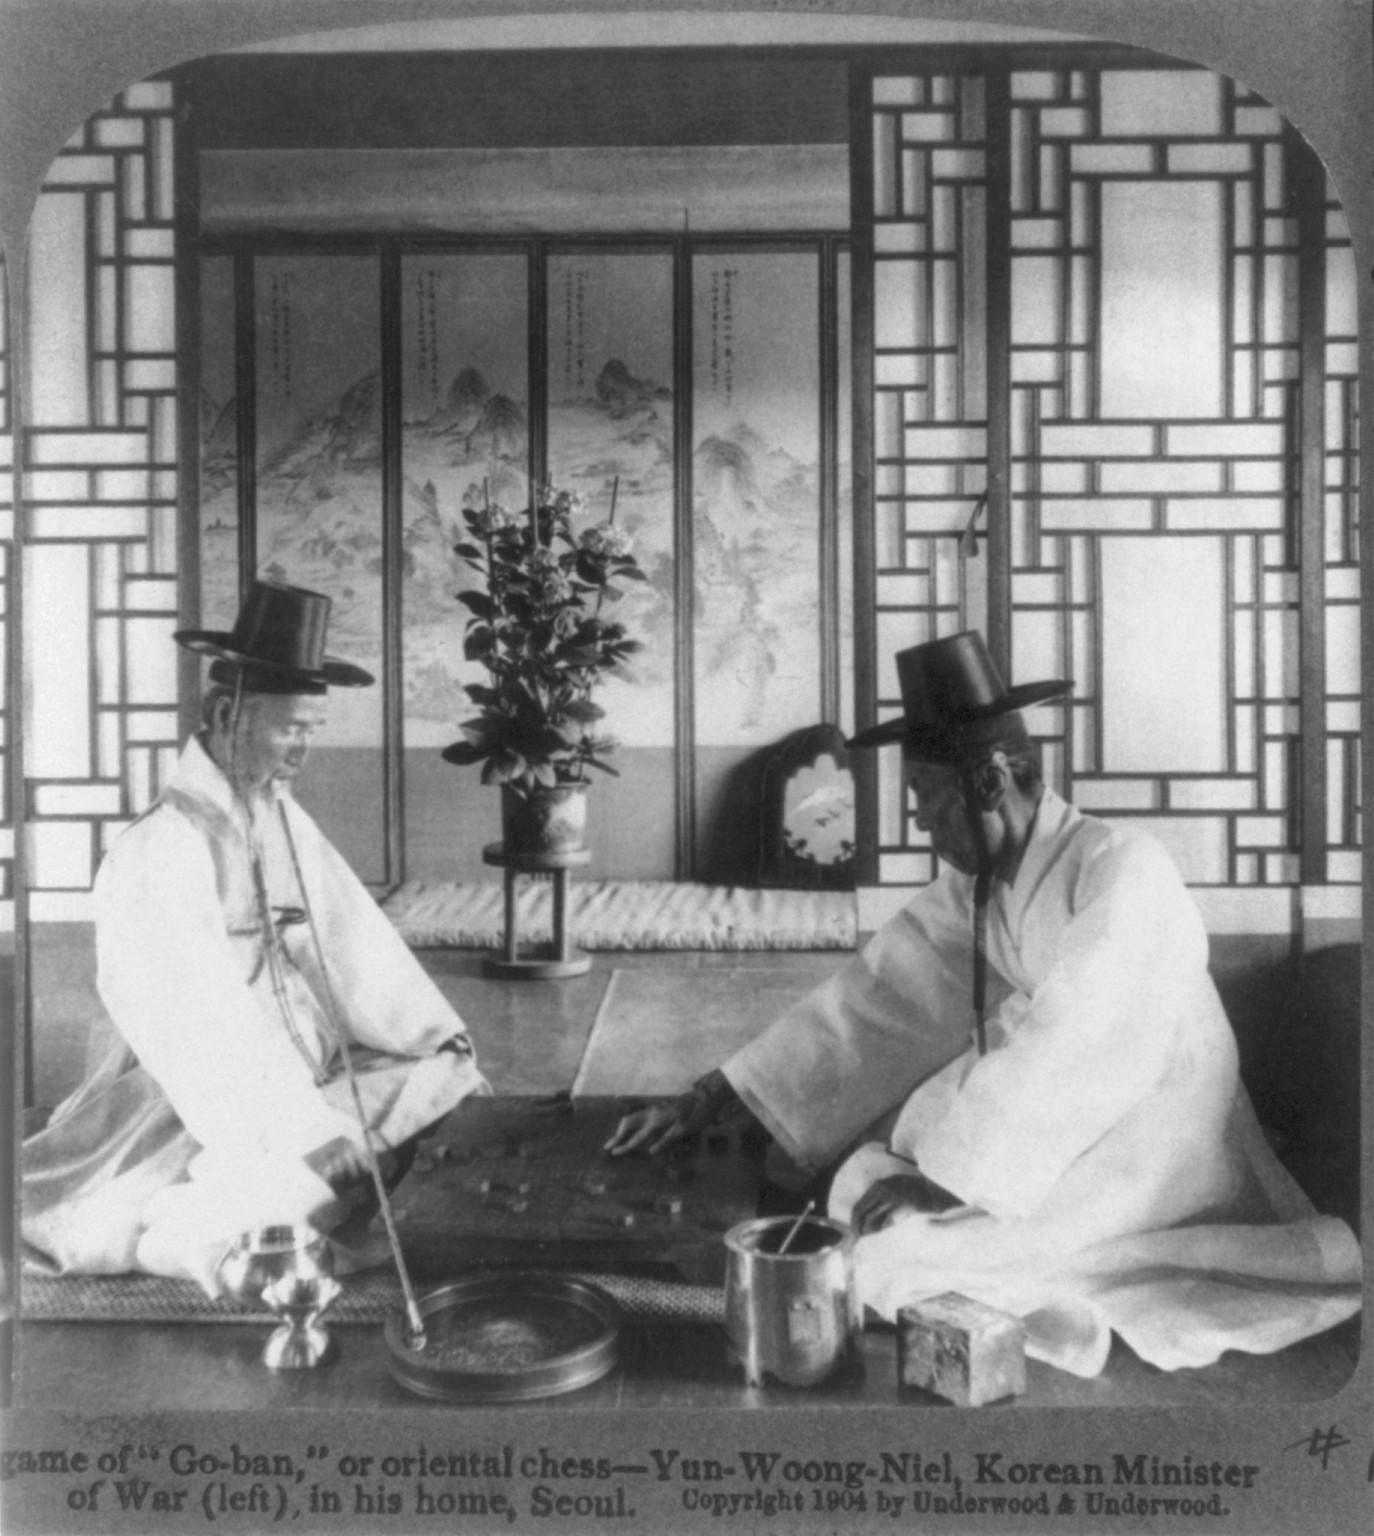 Korea-History-Goban Game in Seoul Korea 1904 (LOC).jpg